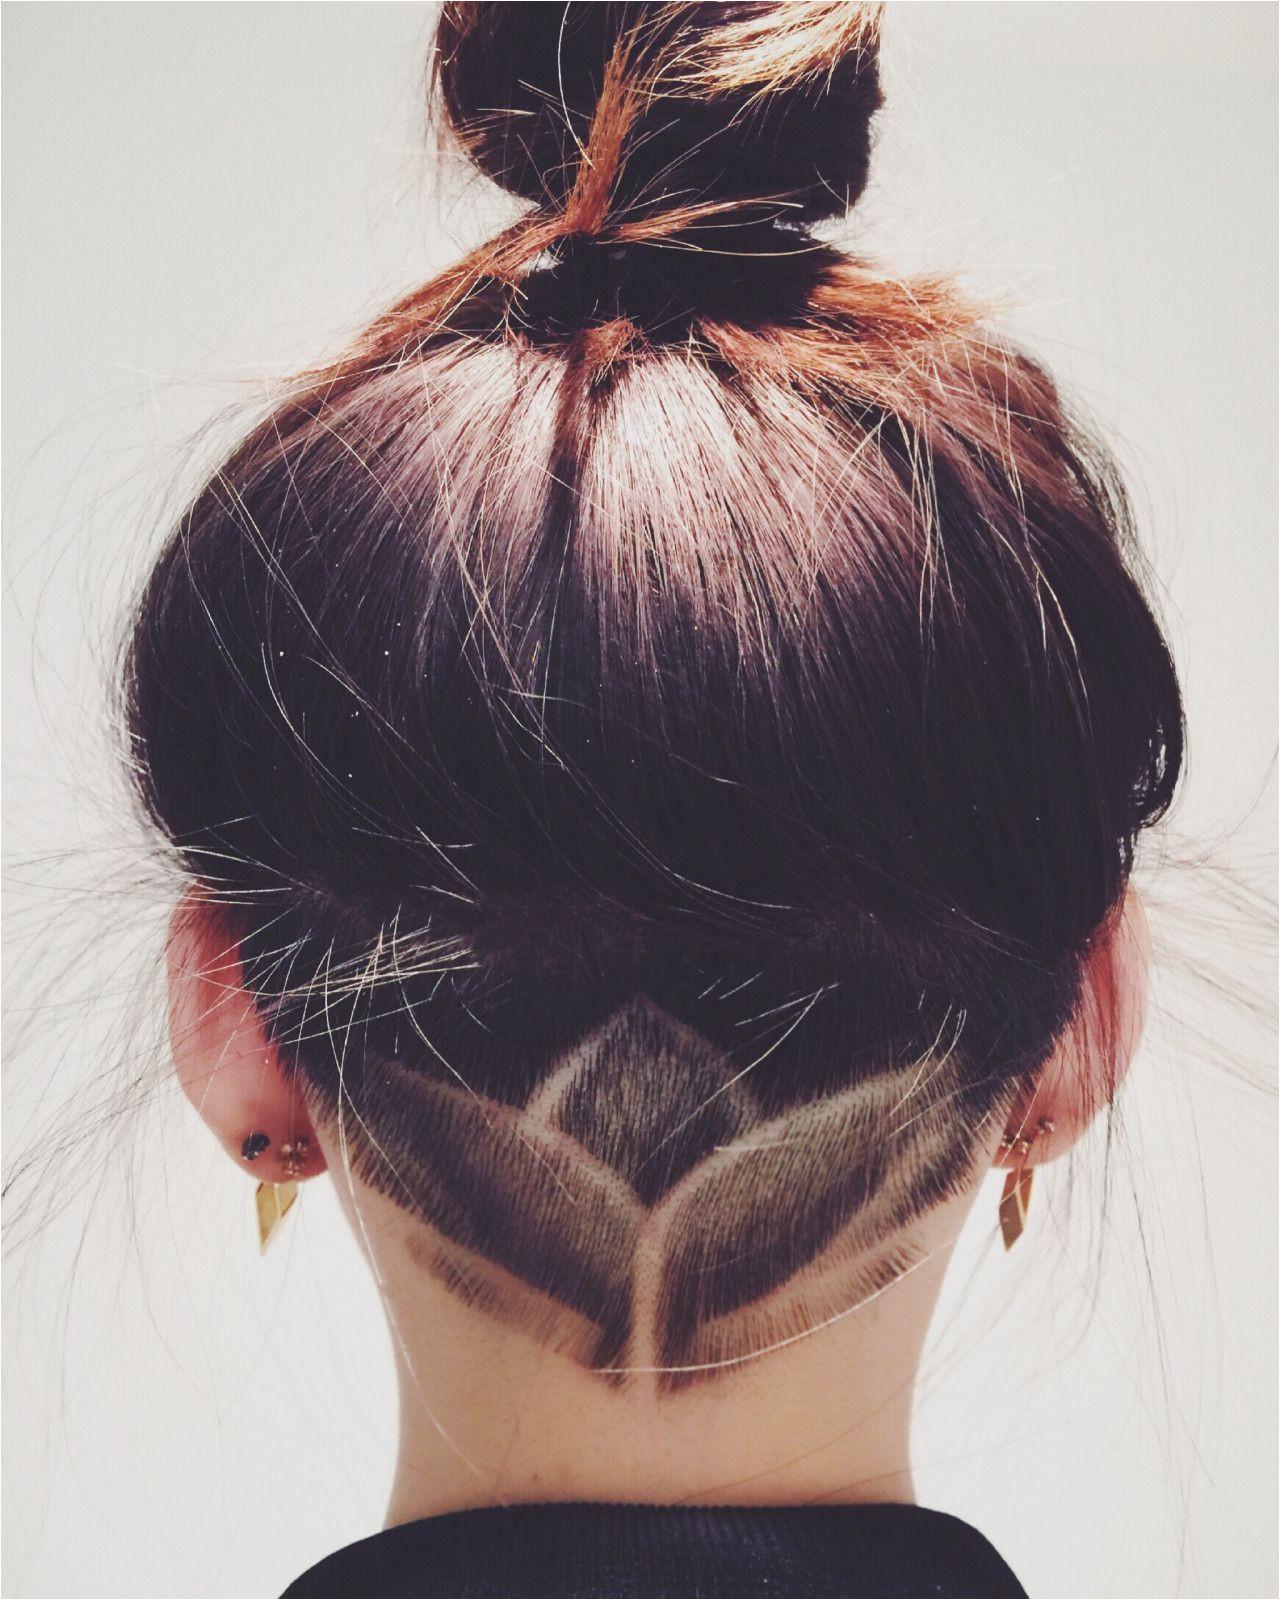 Shornnape SHNFEED submit your Undercuts Penteados Raspados Hair Tattoos Undercut Tattoos